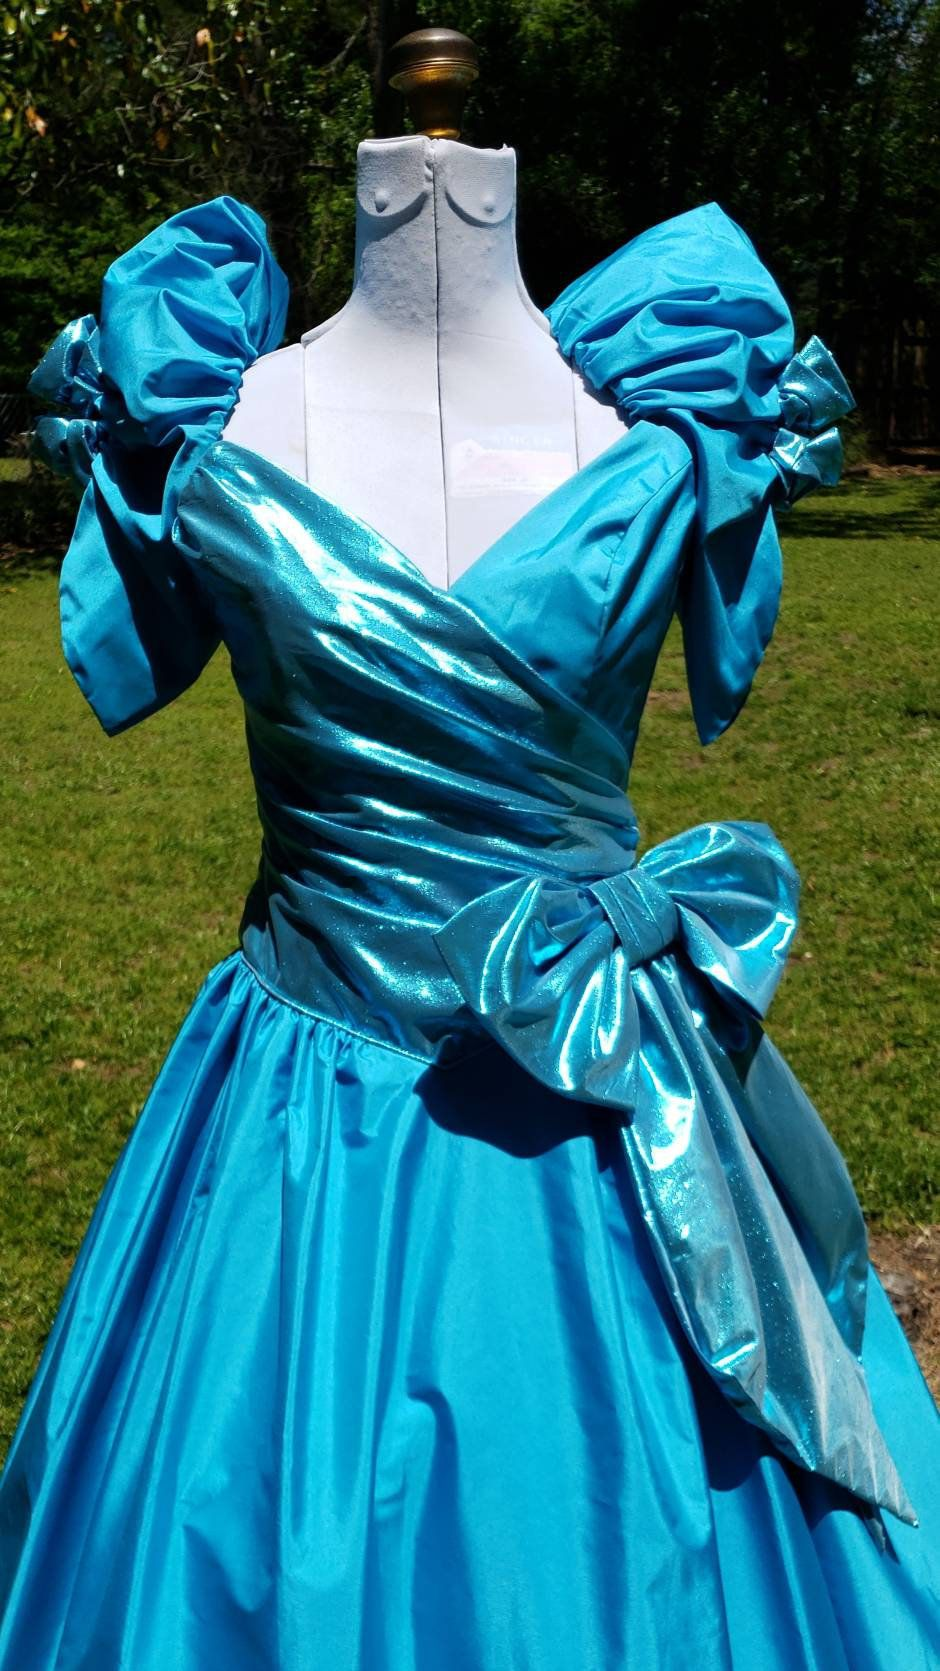 80s Prom Dress Light Blue Metallic Puffy Sleeves 80s Prom Dress Dresses 80s Prom [ 1671 x 940 Pixel ]